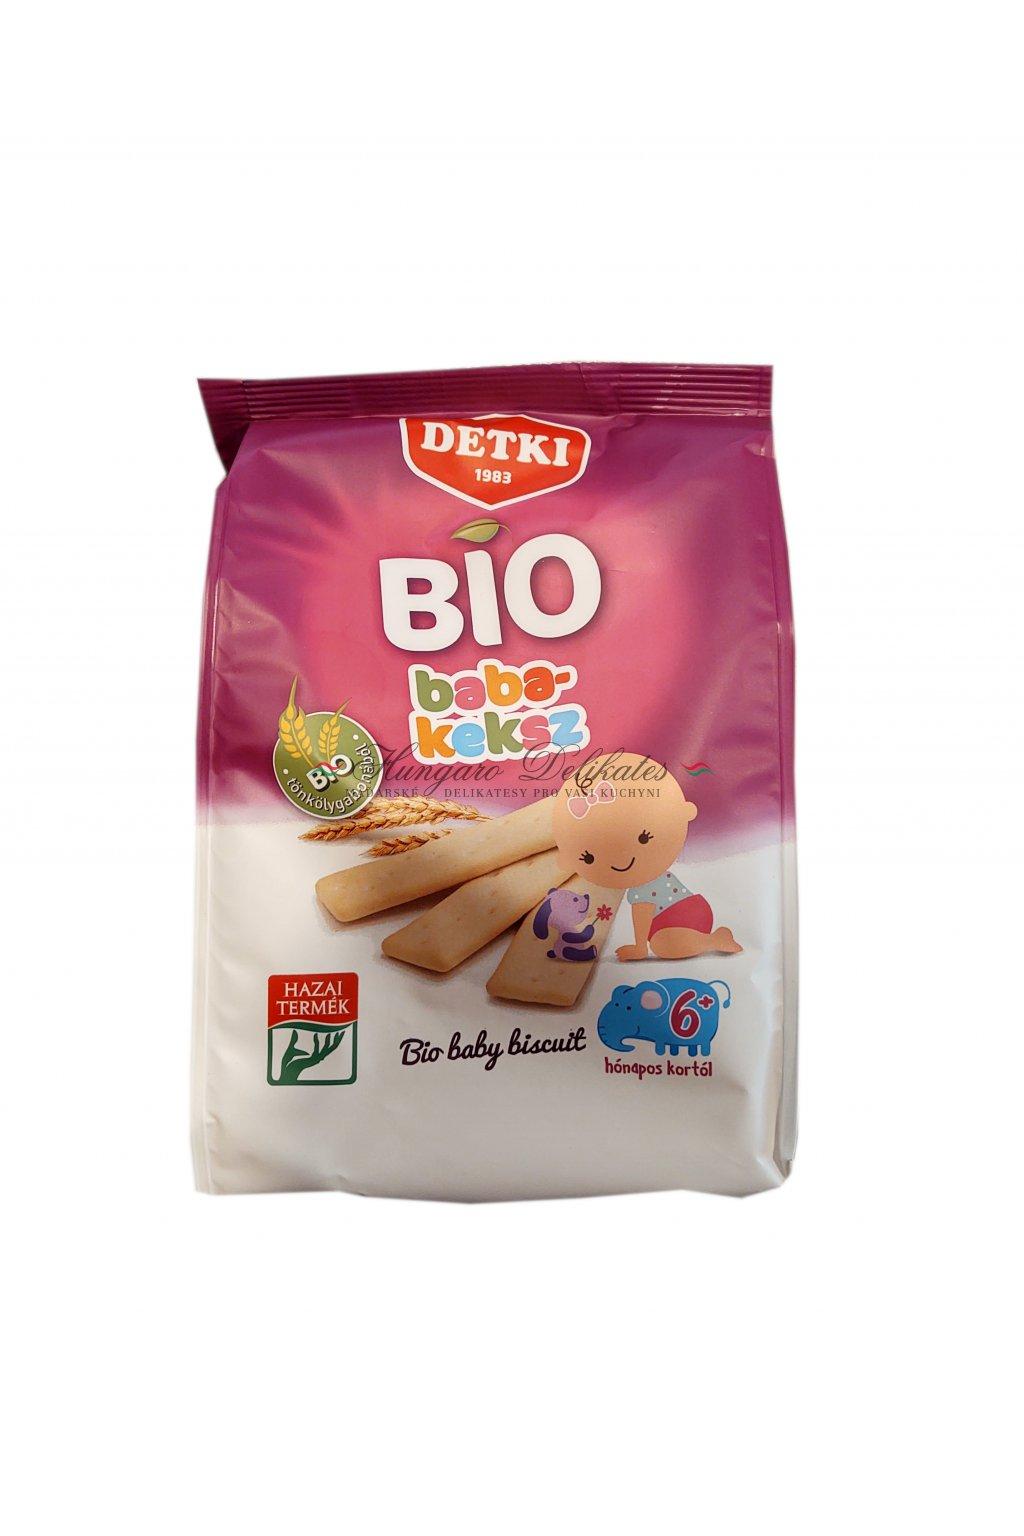 bio baby sušenky pro děti